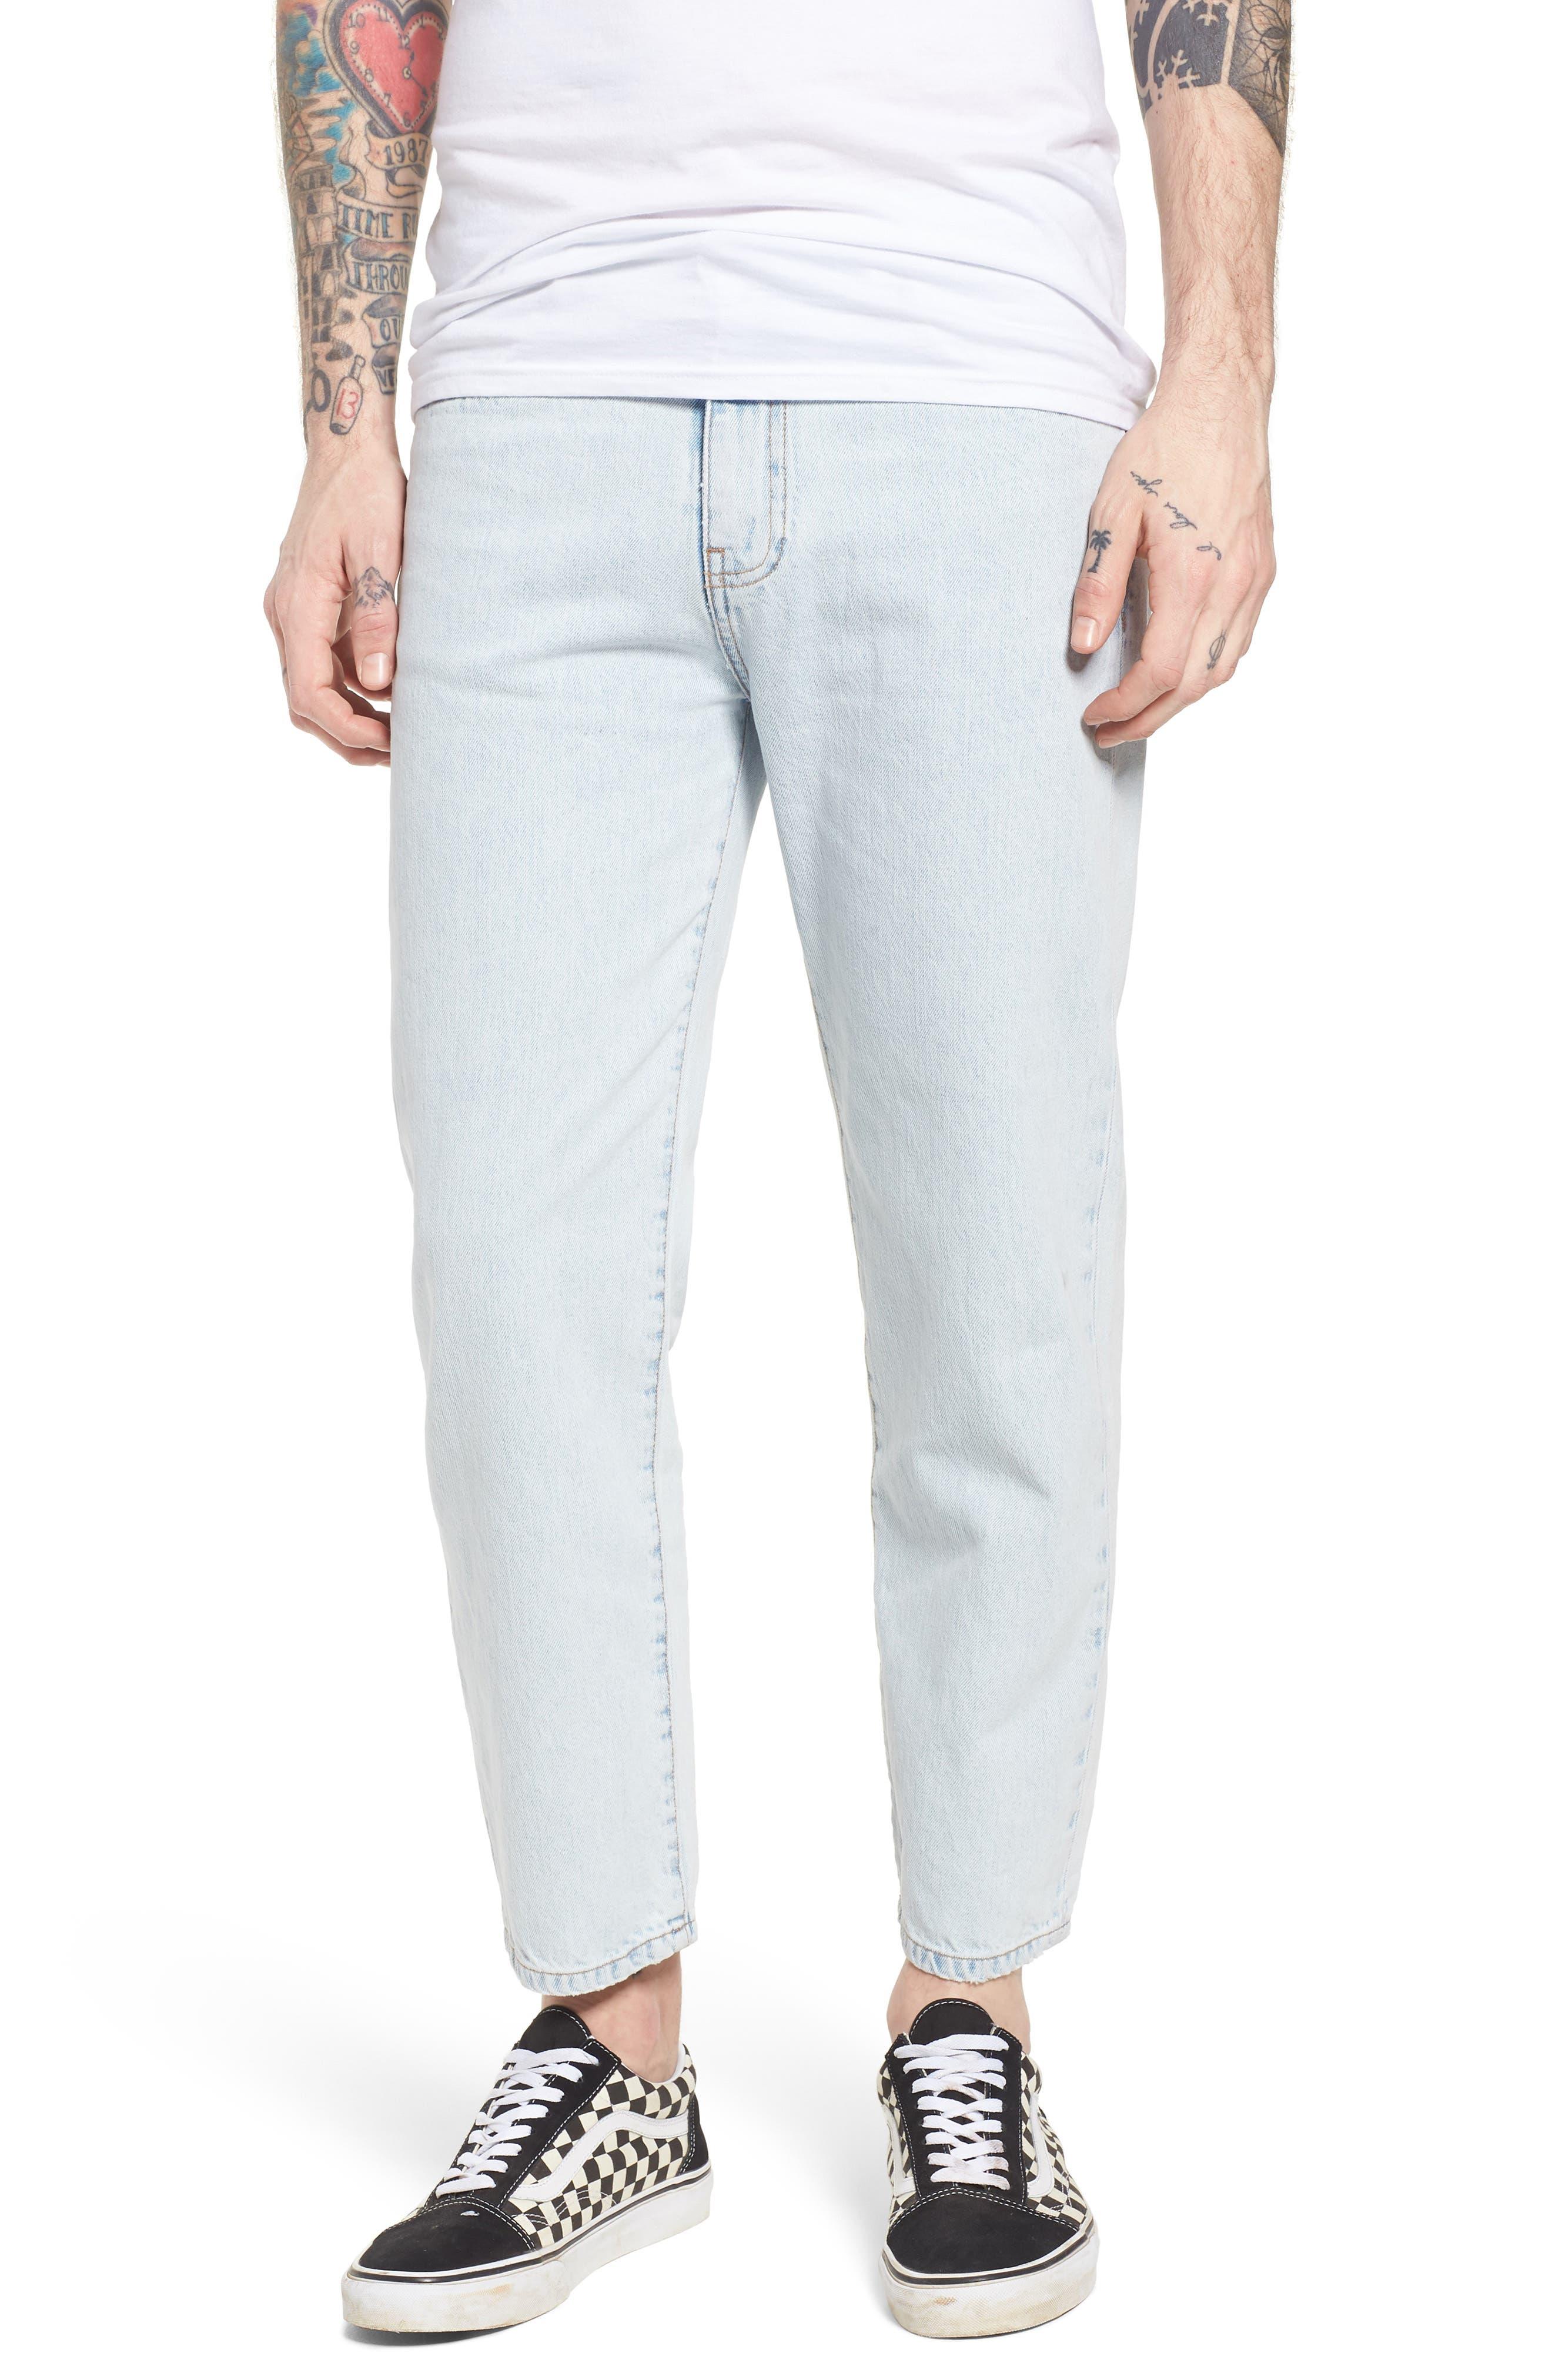 Otis Straight Fit Jeans,                             Main thumbnail 1, color,                             401